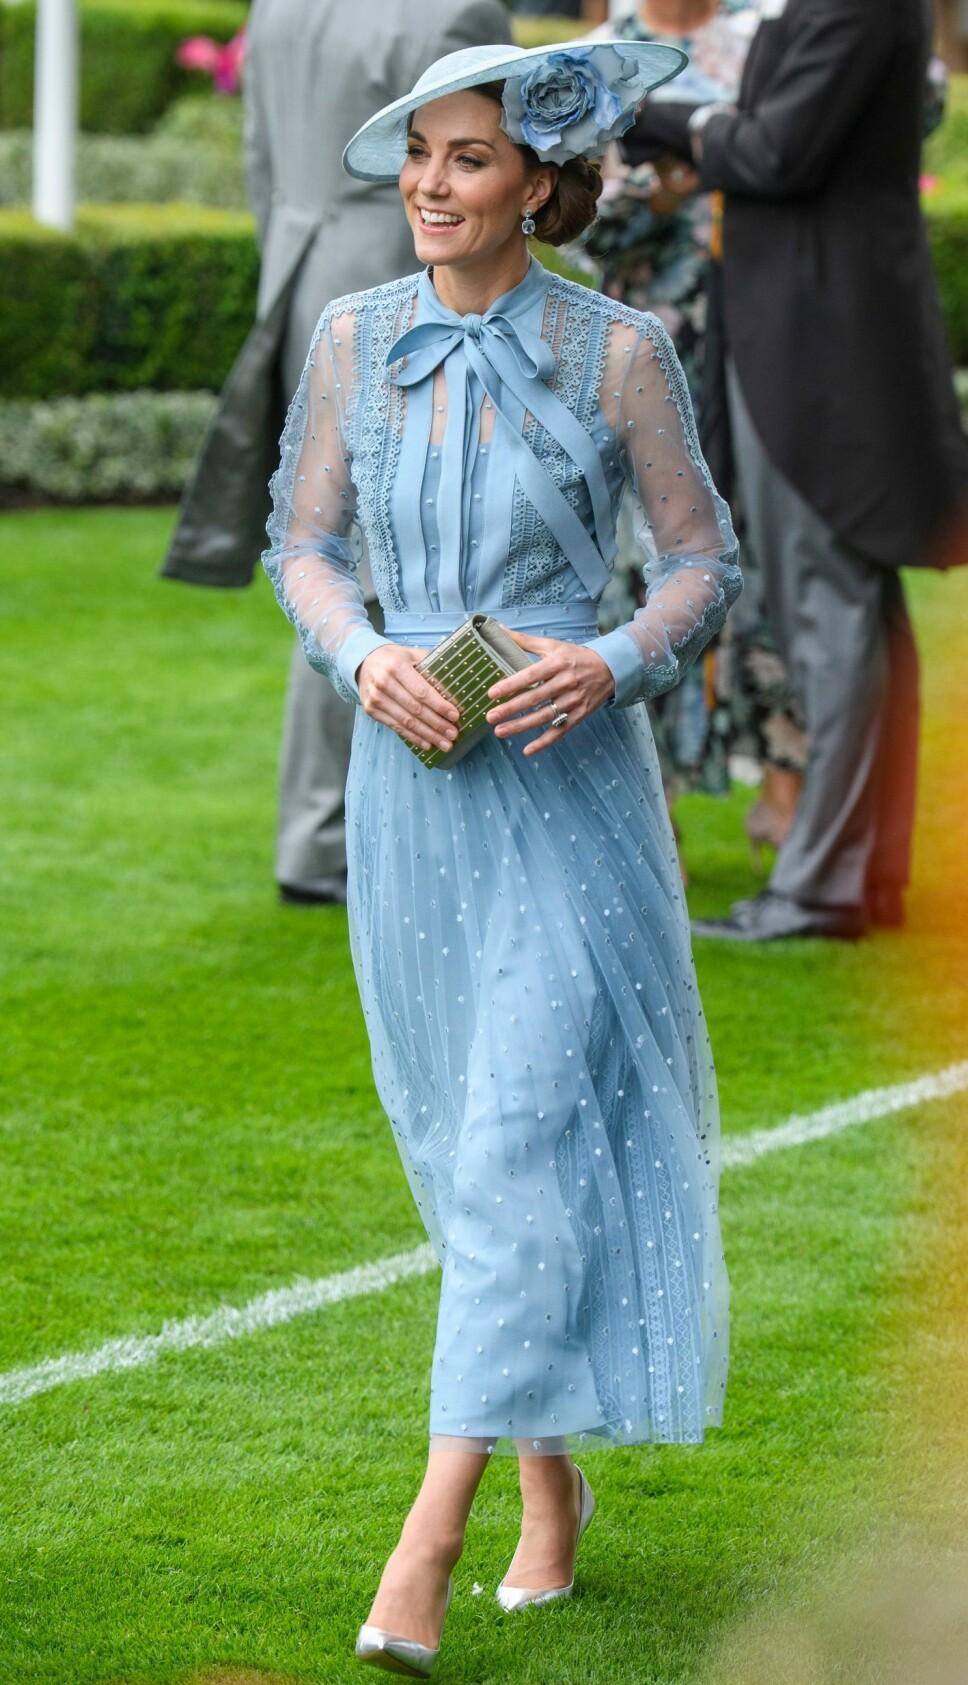 Hertuginne Kate i en nydelig kjole fra Elie Saab.